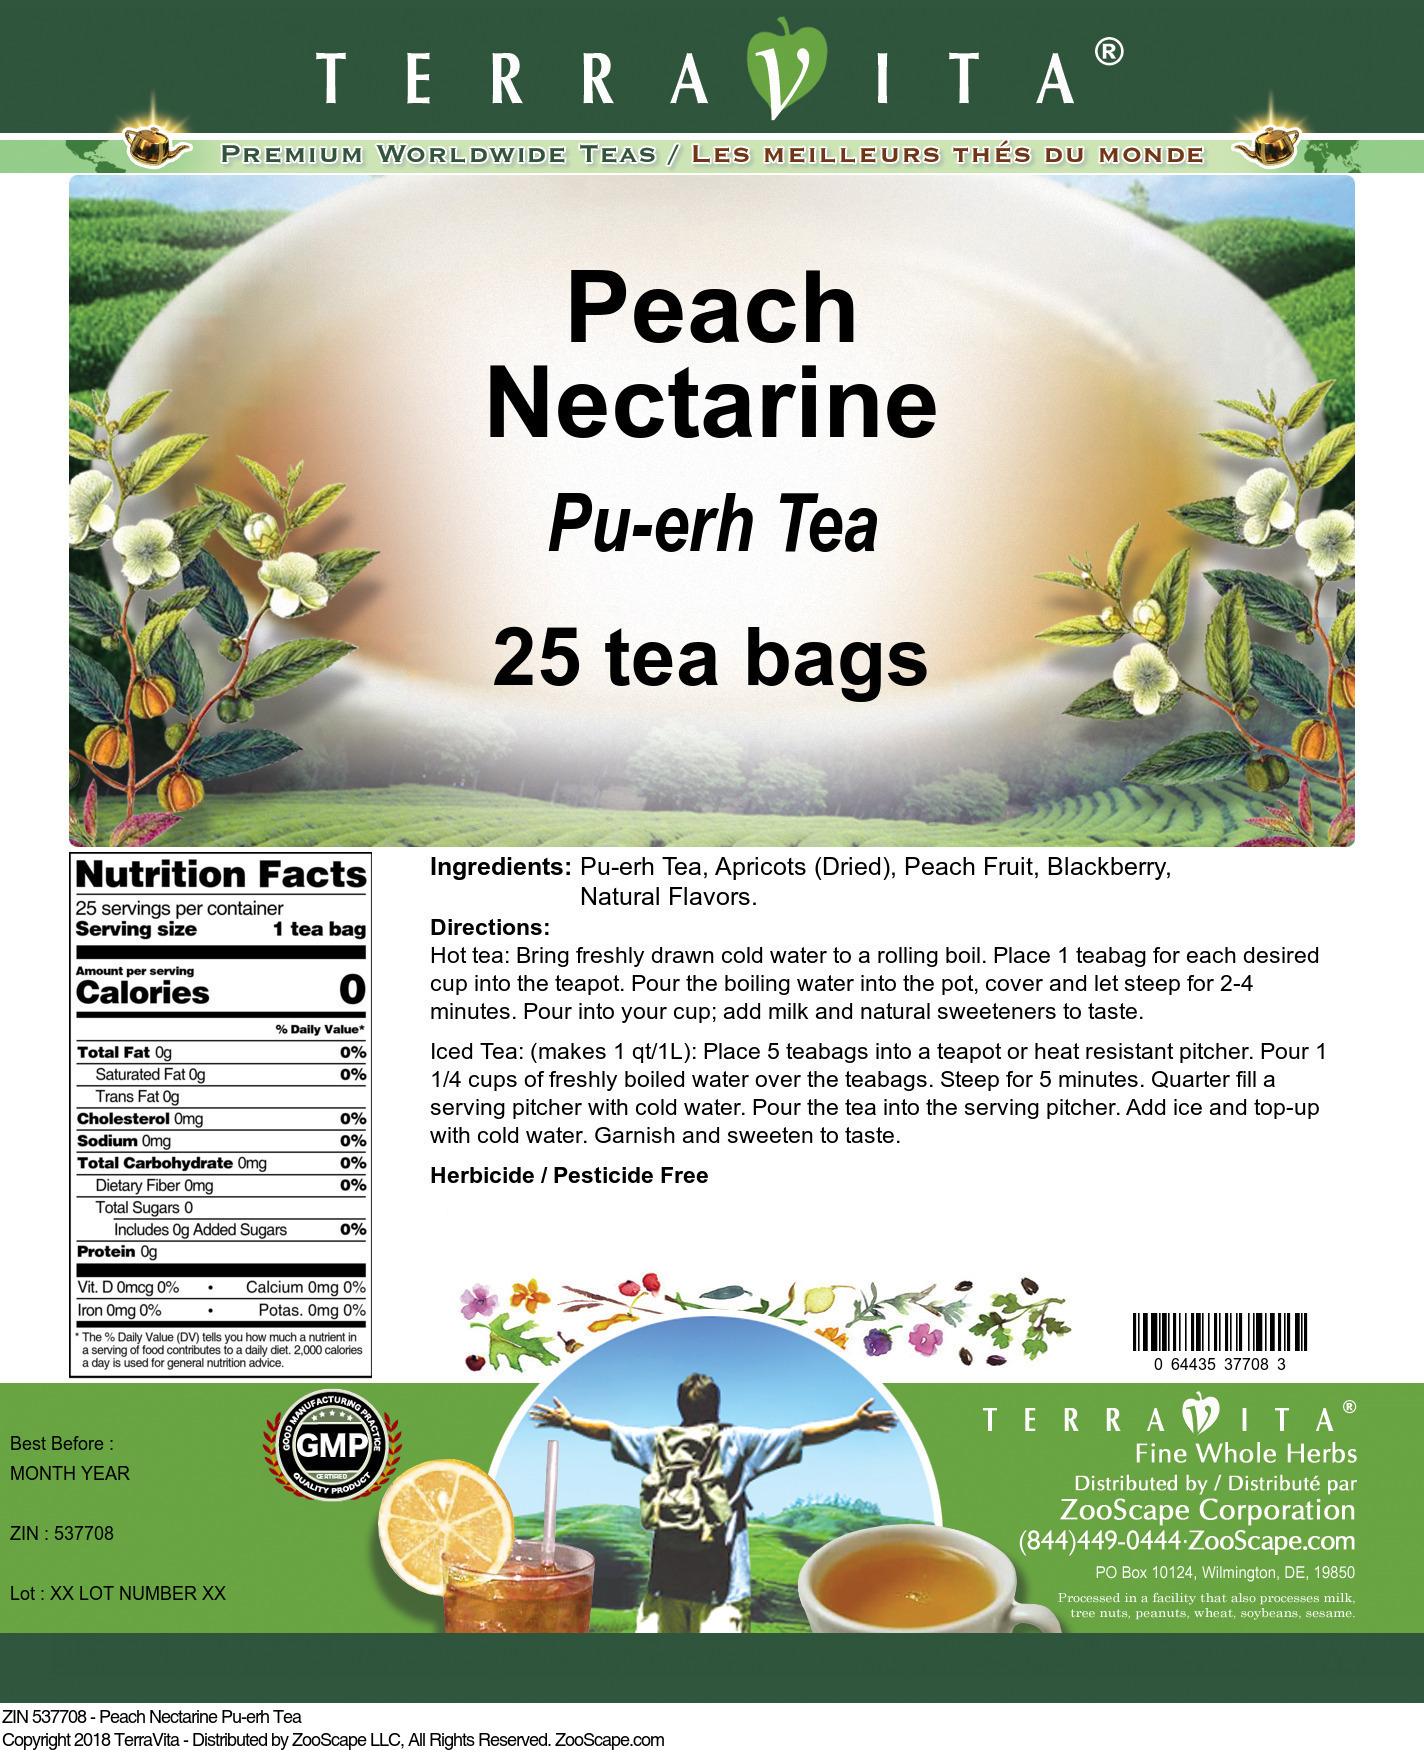 Peach Nectarine Pu-erh Tea